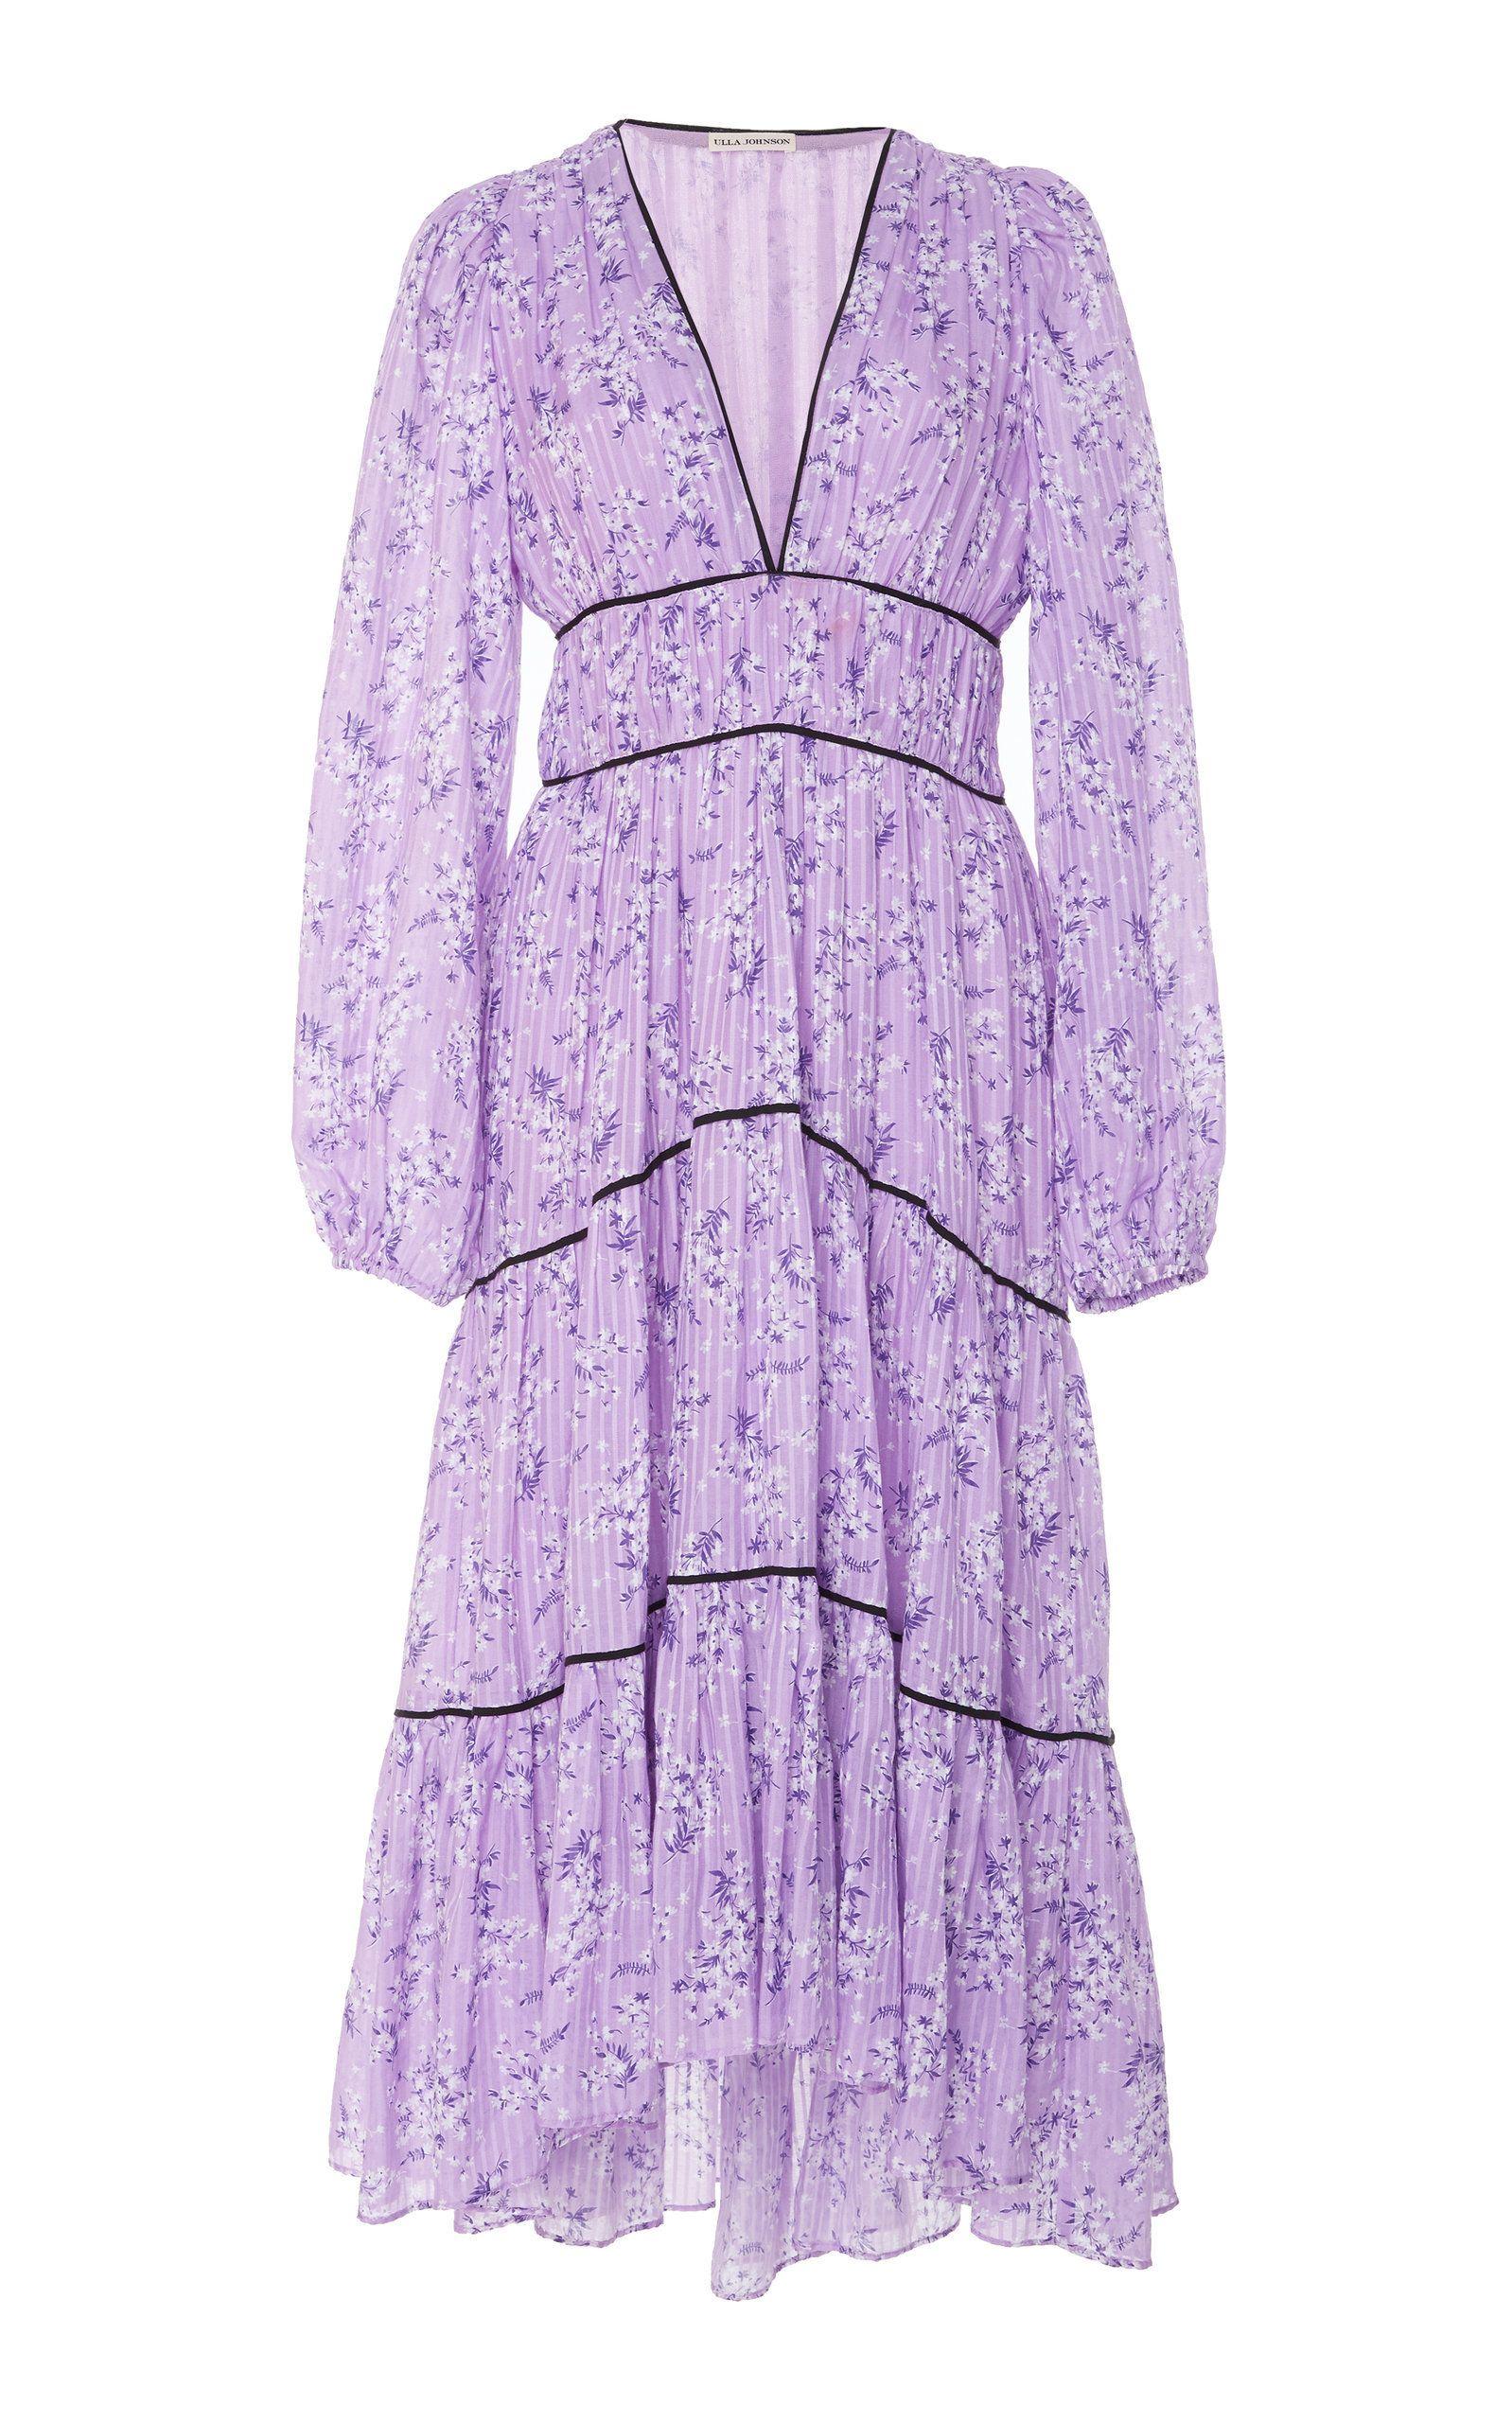 Women/'s Party Dress Purple Pink Tiered Ruffles Silk-like  Midi by Click